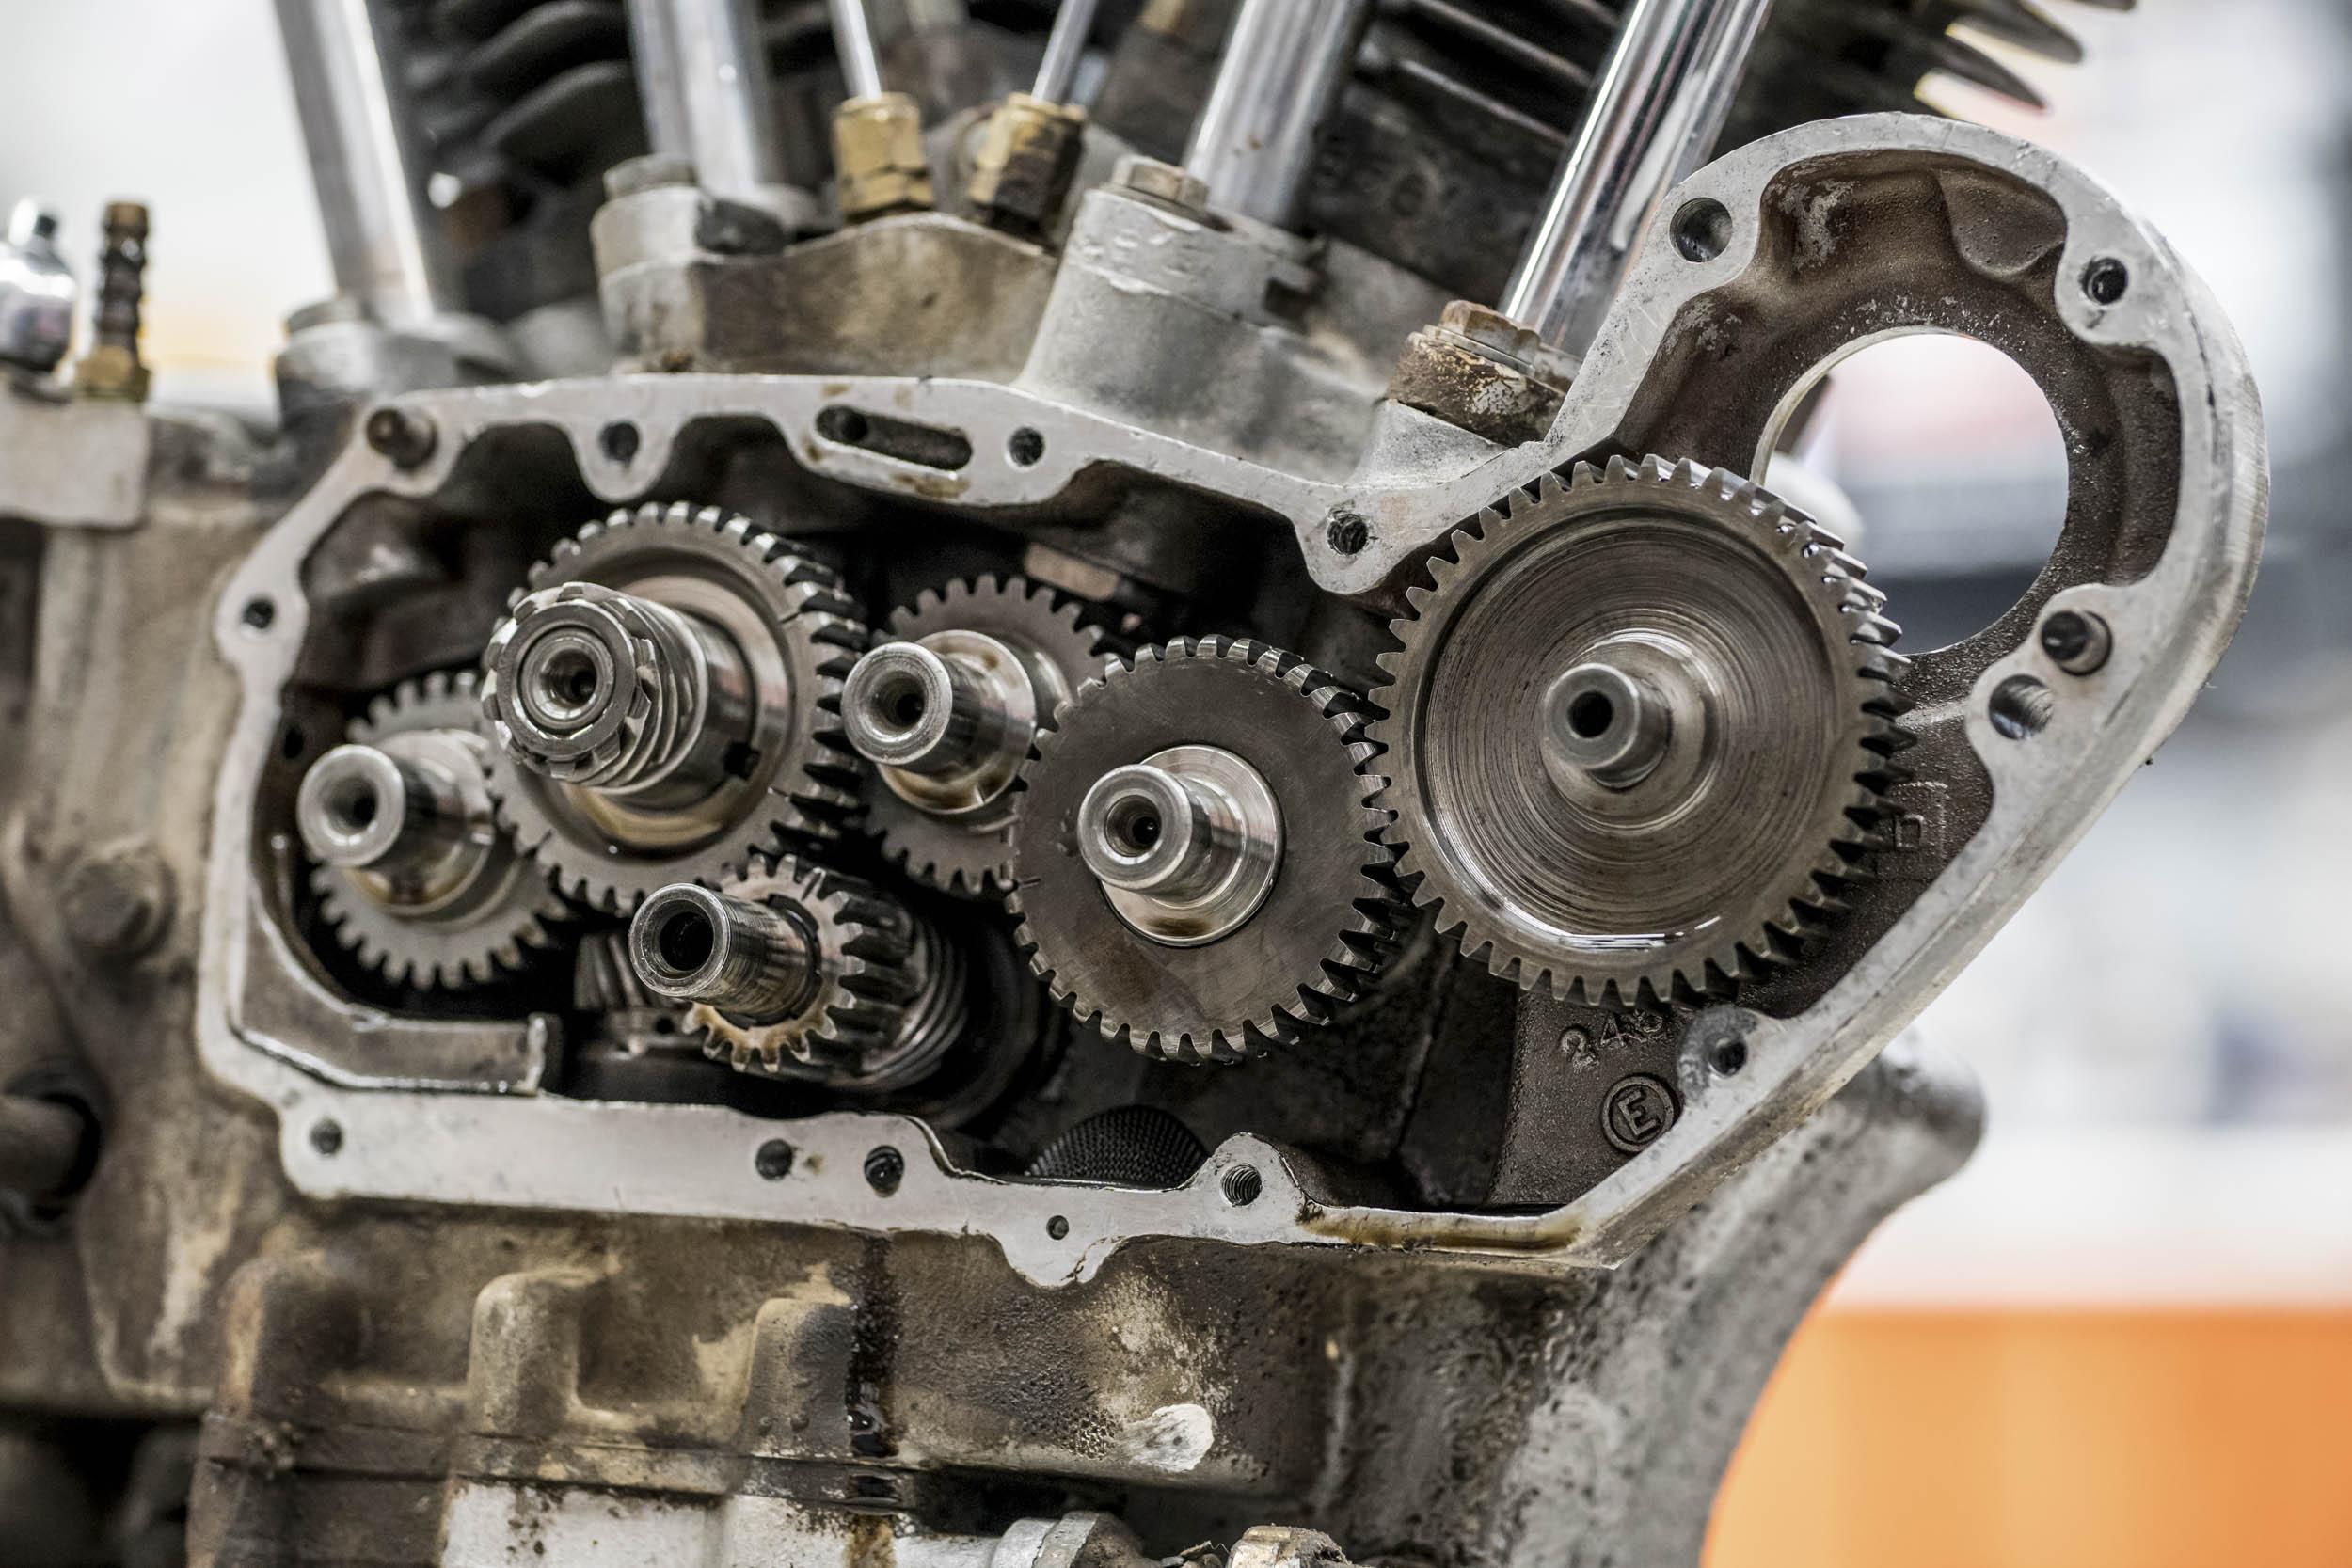 1957 Harley-Davidson Sportster XL engine